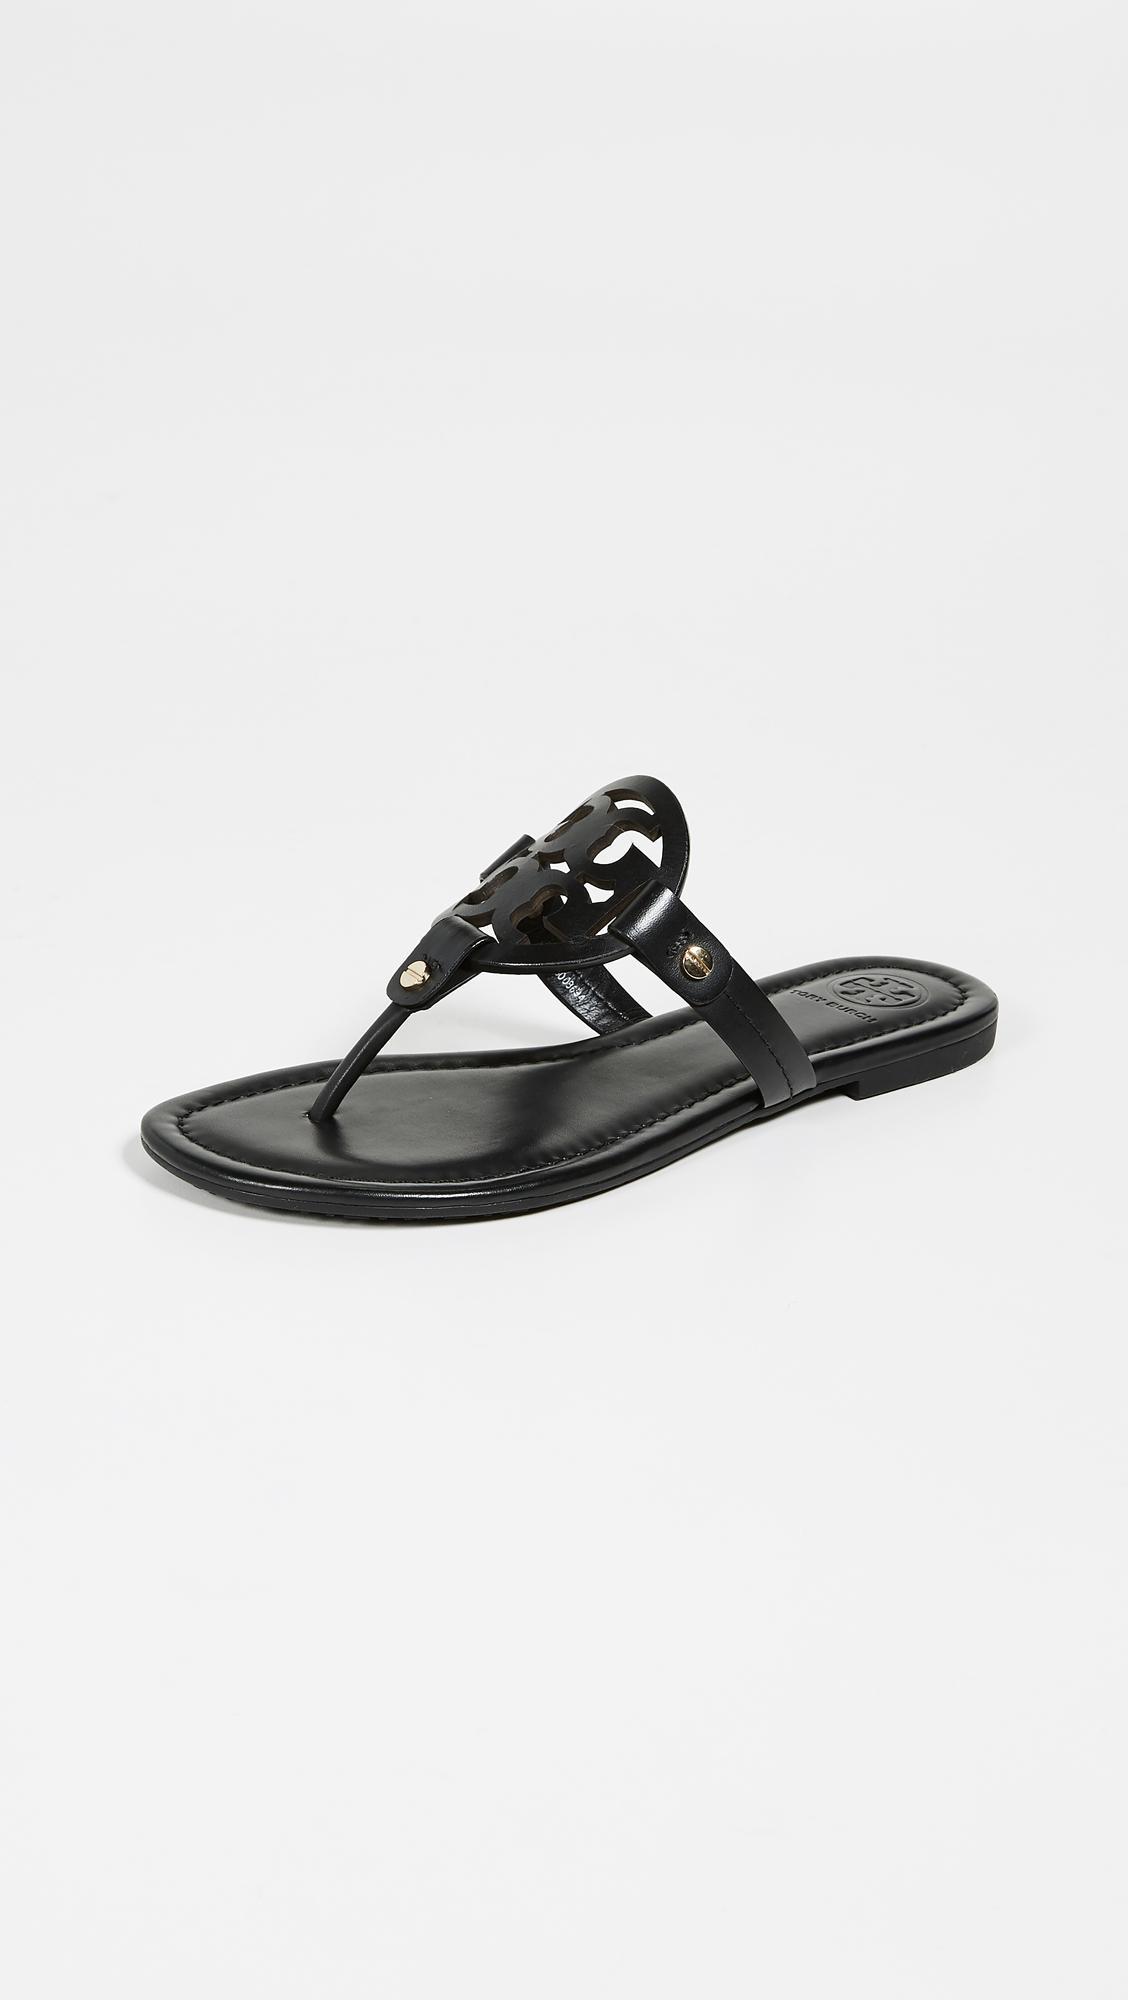 049a0c602b9458 Tory Burch Miller Thong Sandals in Black - Lyst